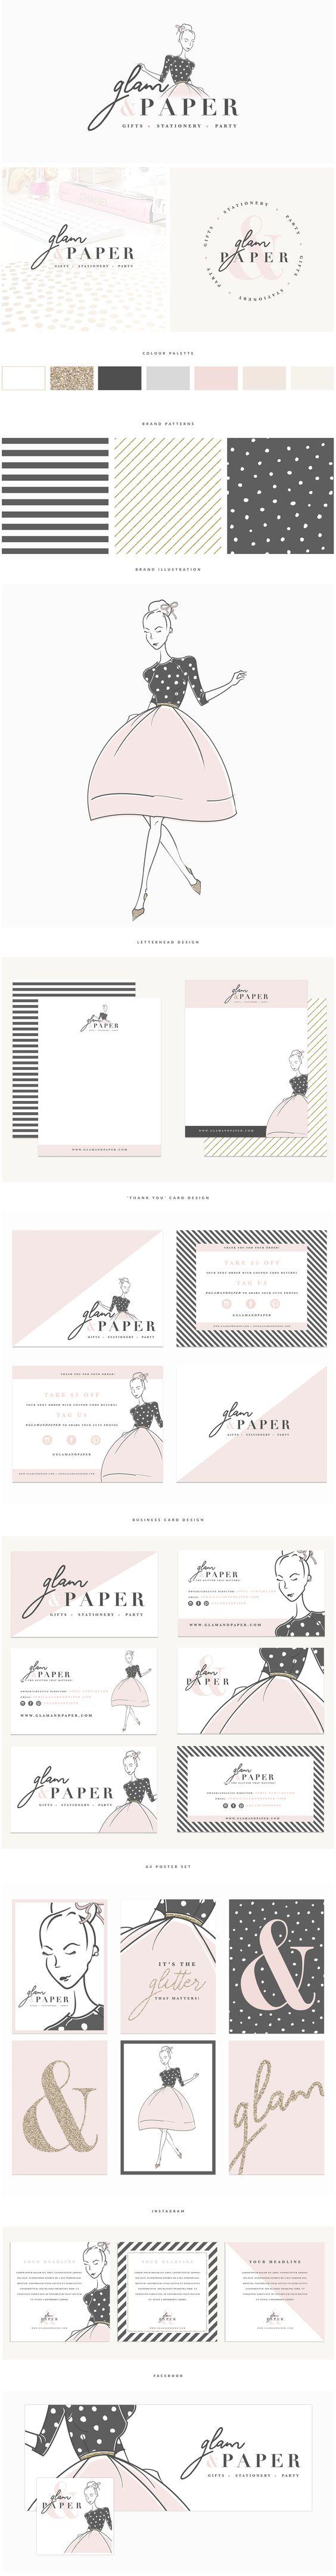 www.brandmebeautiful.co.uk | enquiries@brandmebeautiful.co.uk | Glam & Paper Rebrand #branding #branddesign #black #pink #gold #glitter #logo #design